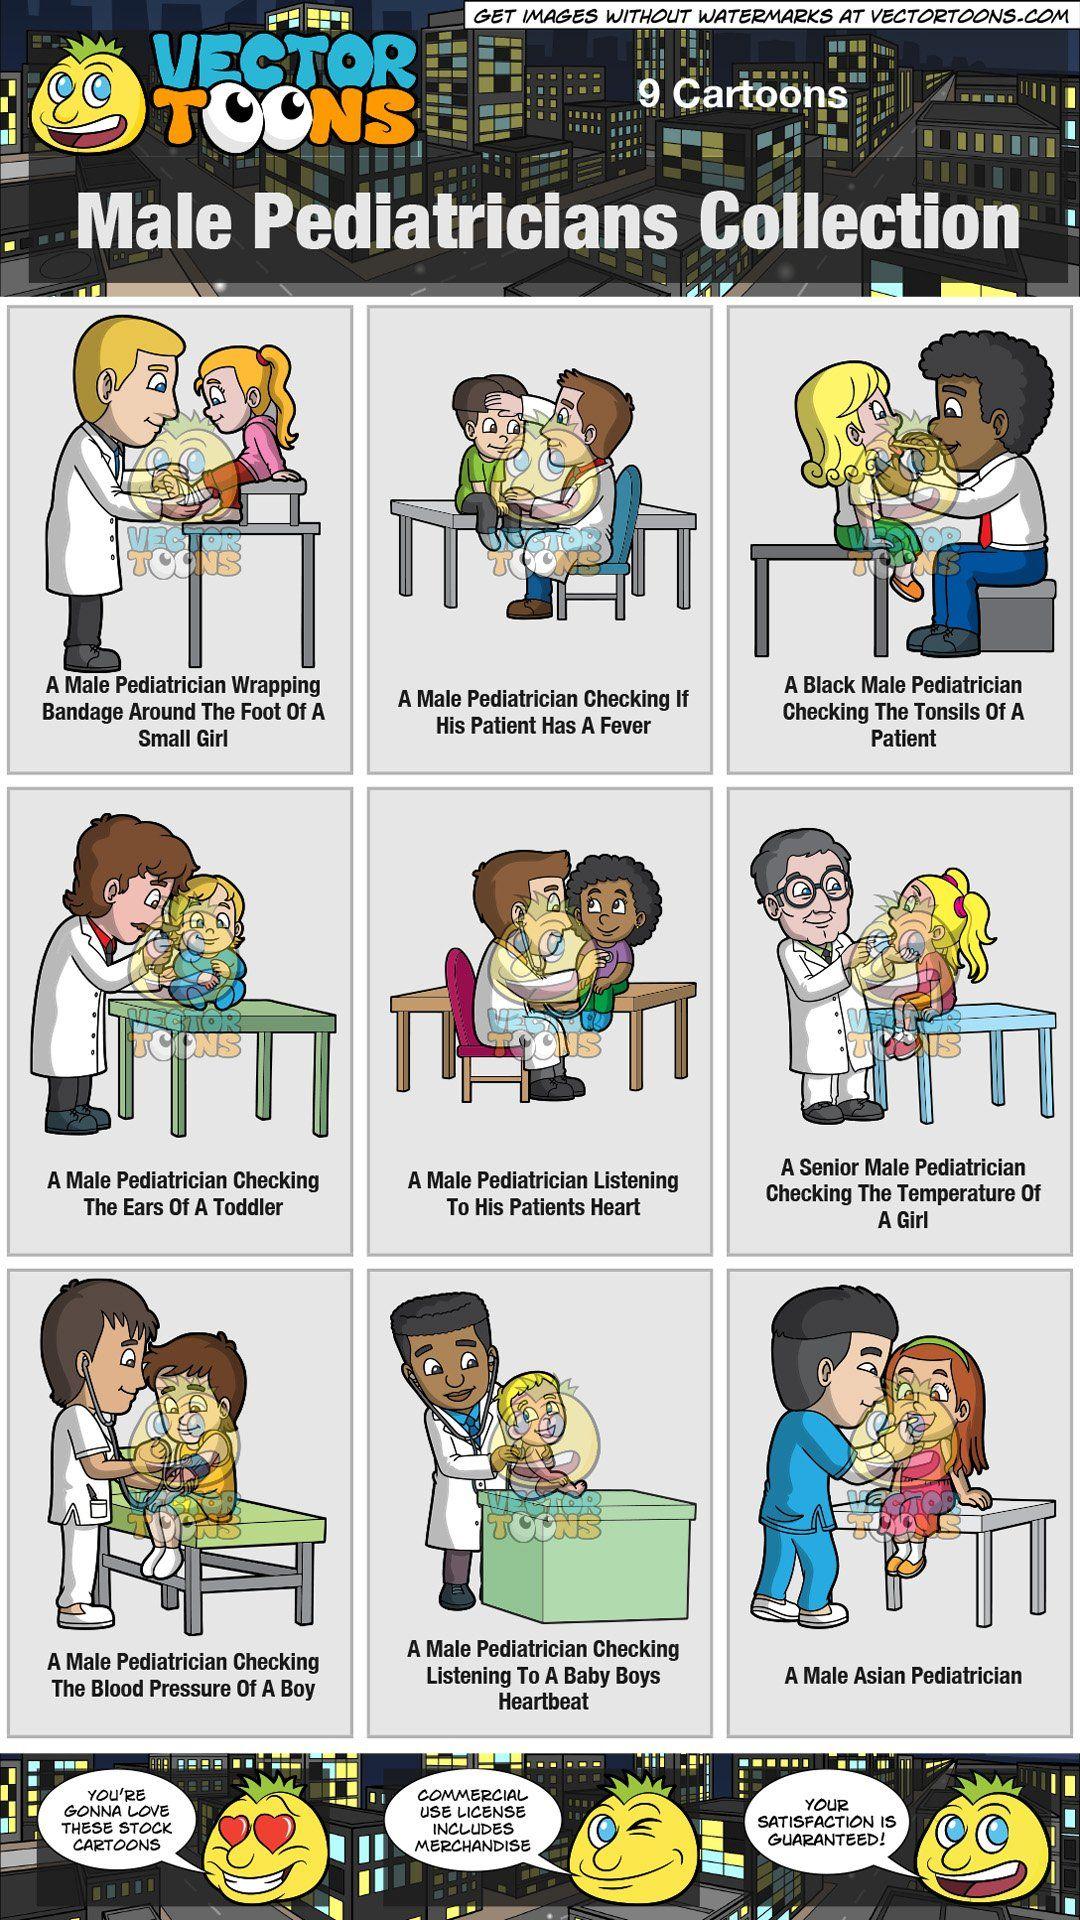 Pediatrician clipart male pediatrician. Pediatricians collection vendor vectortoons